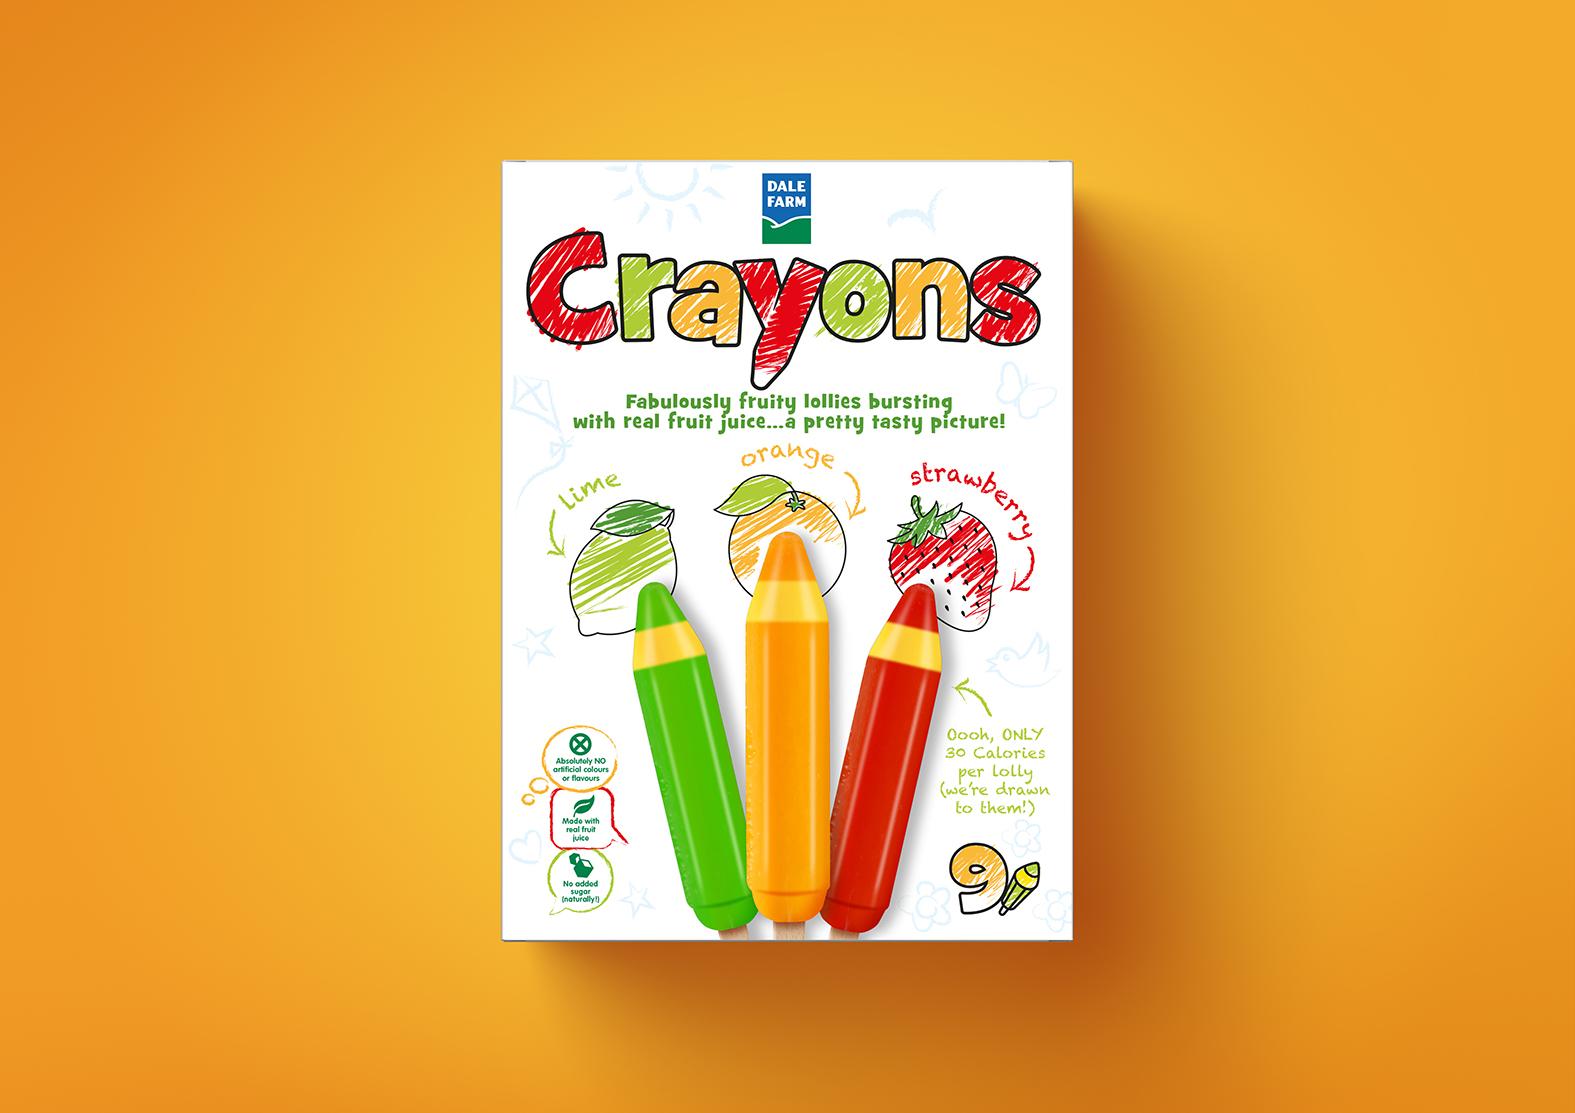 Simon Pendry Creative Crayons Brand Creation